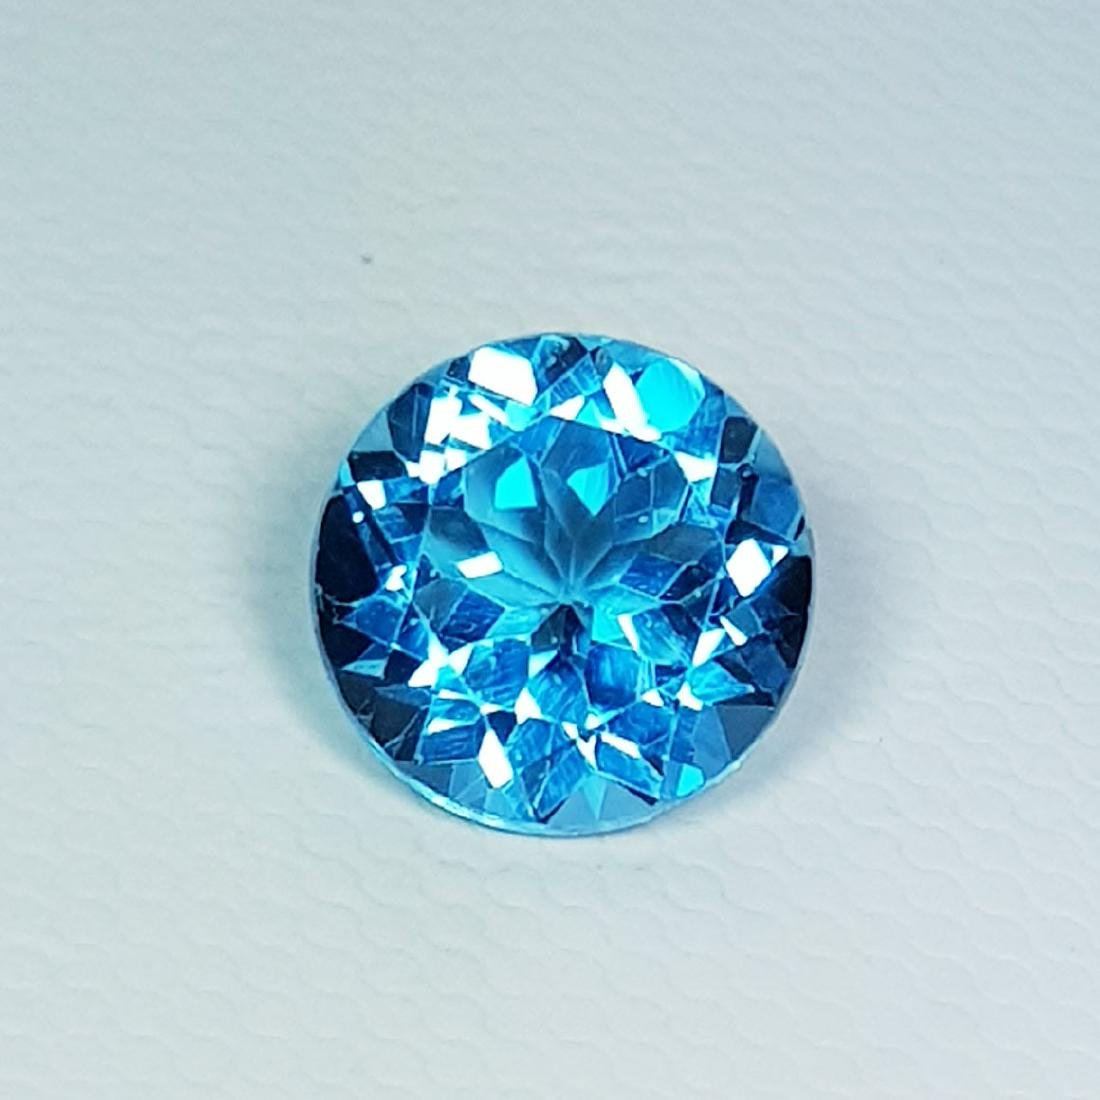 Natural Blue Topaz Round Cut 3.30 ct